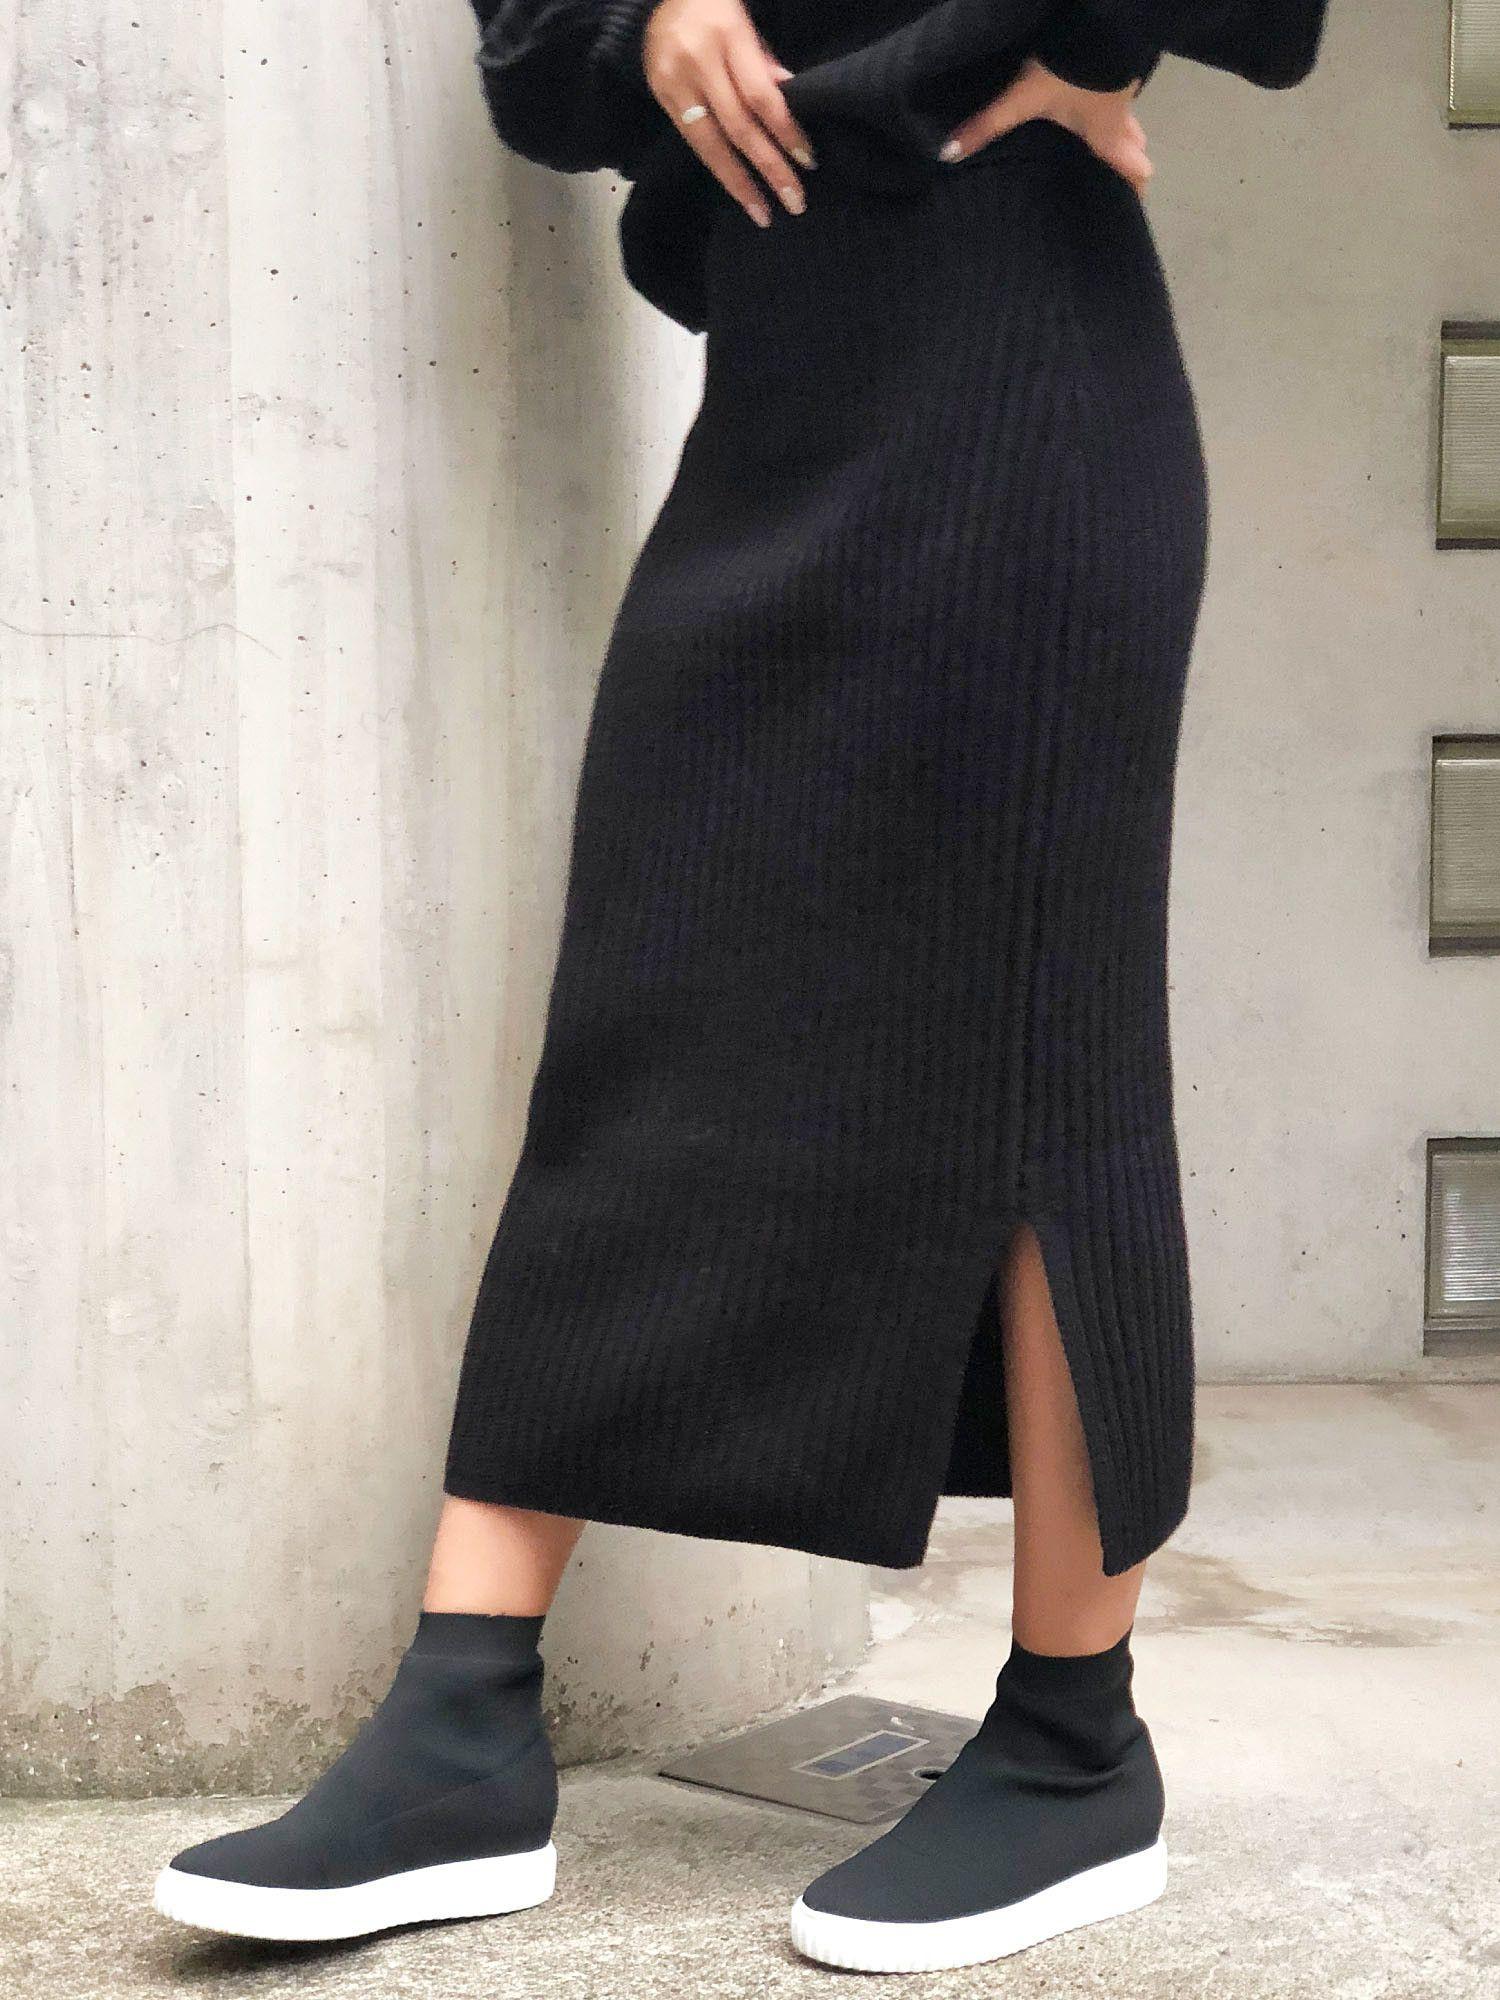 Bulky rib knit skirt